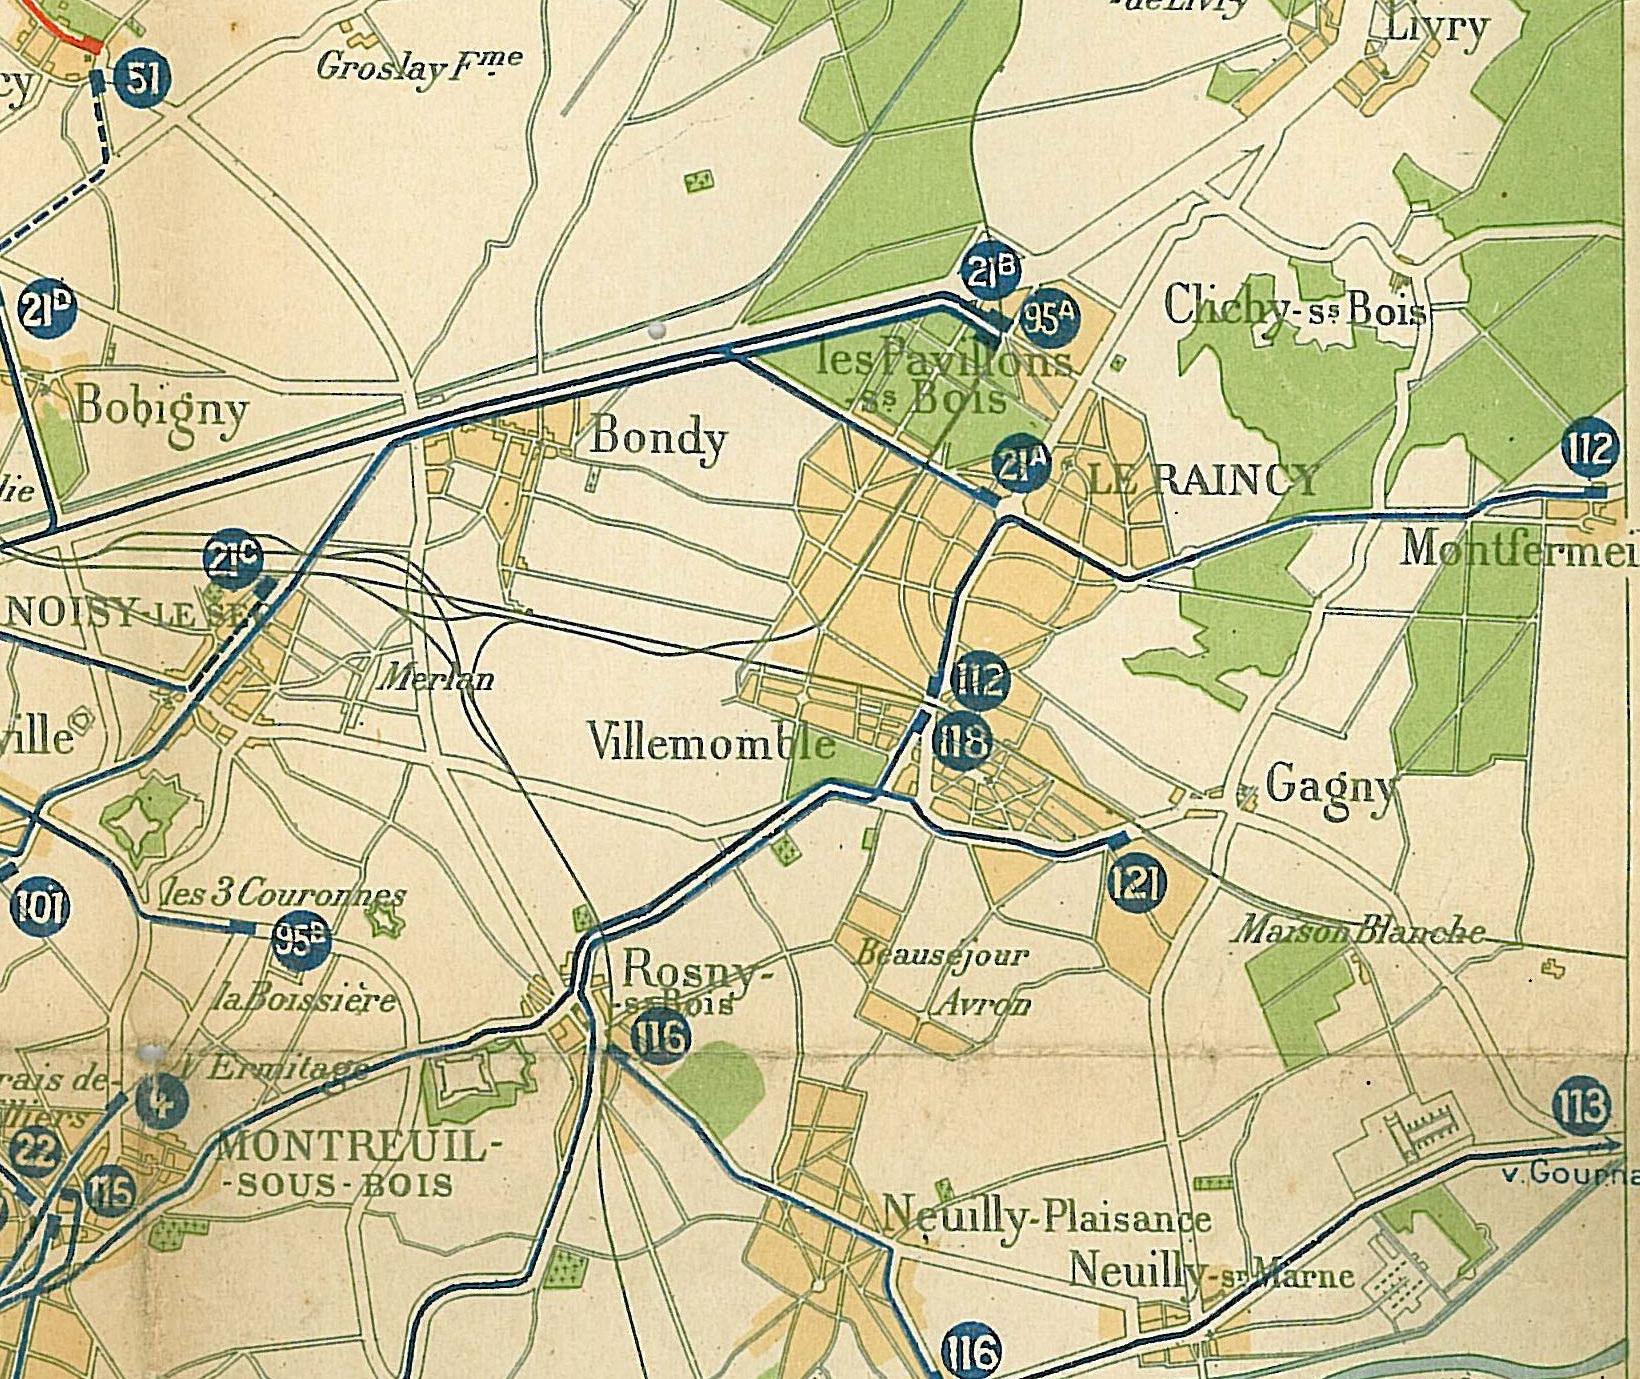 The commune of Les PavillonssousBois was created  ~ Rer Aulnay Sous Bois